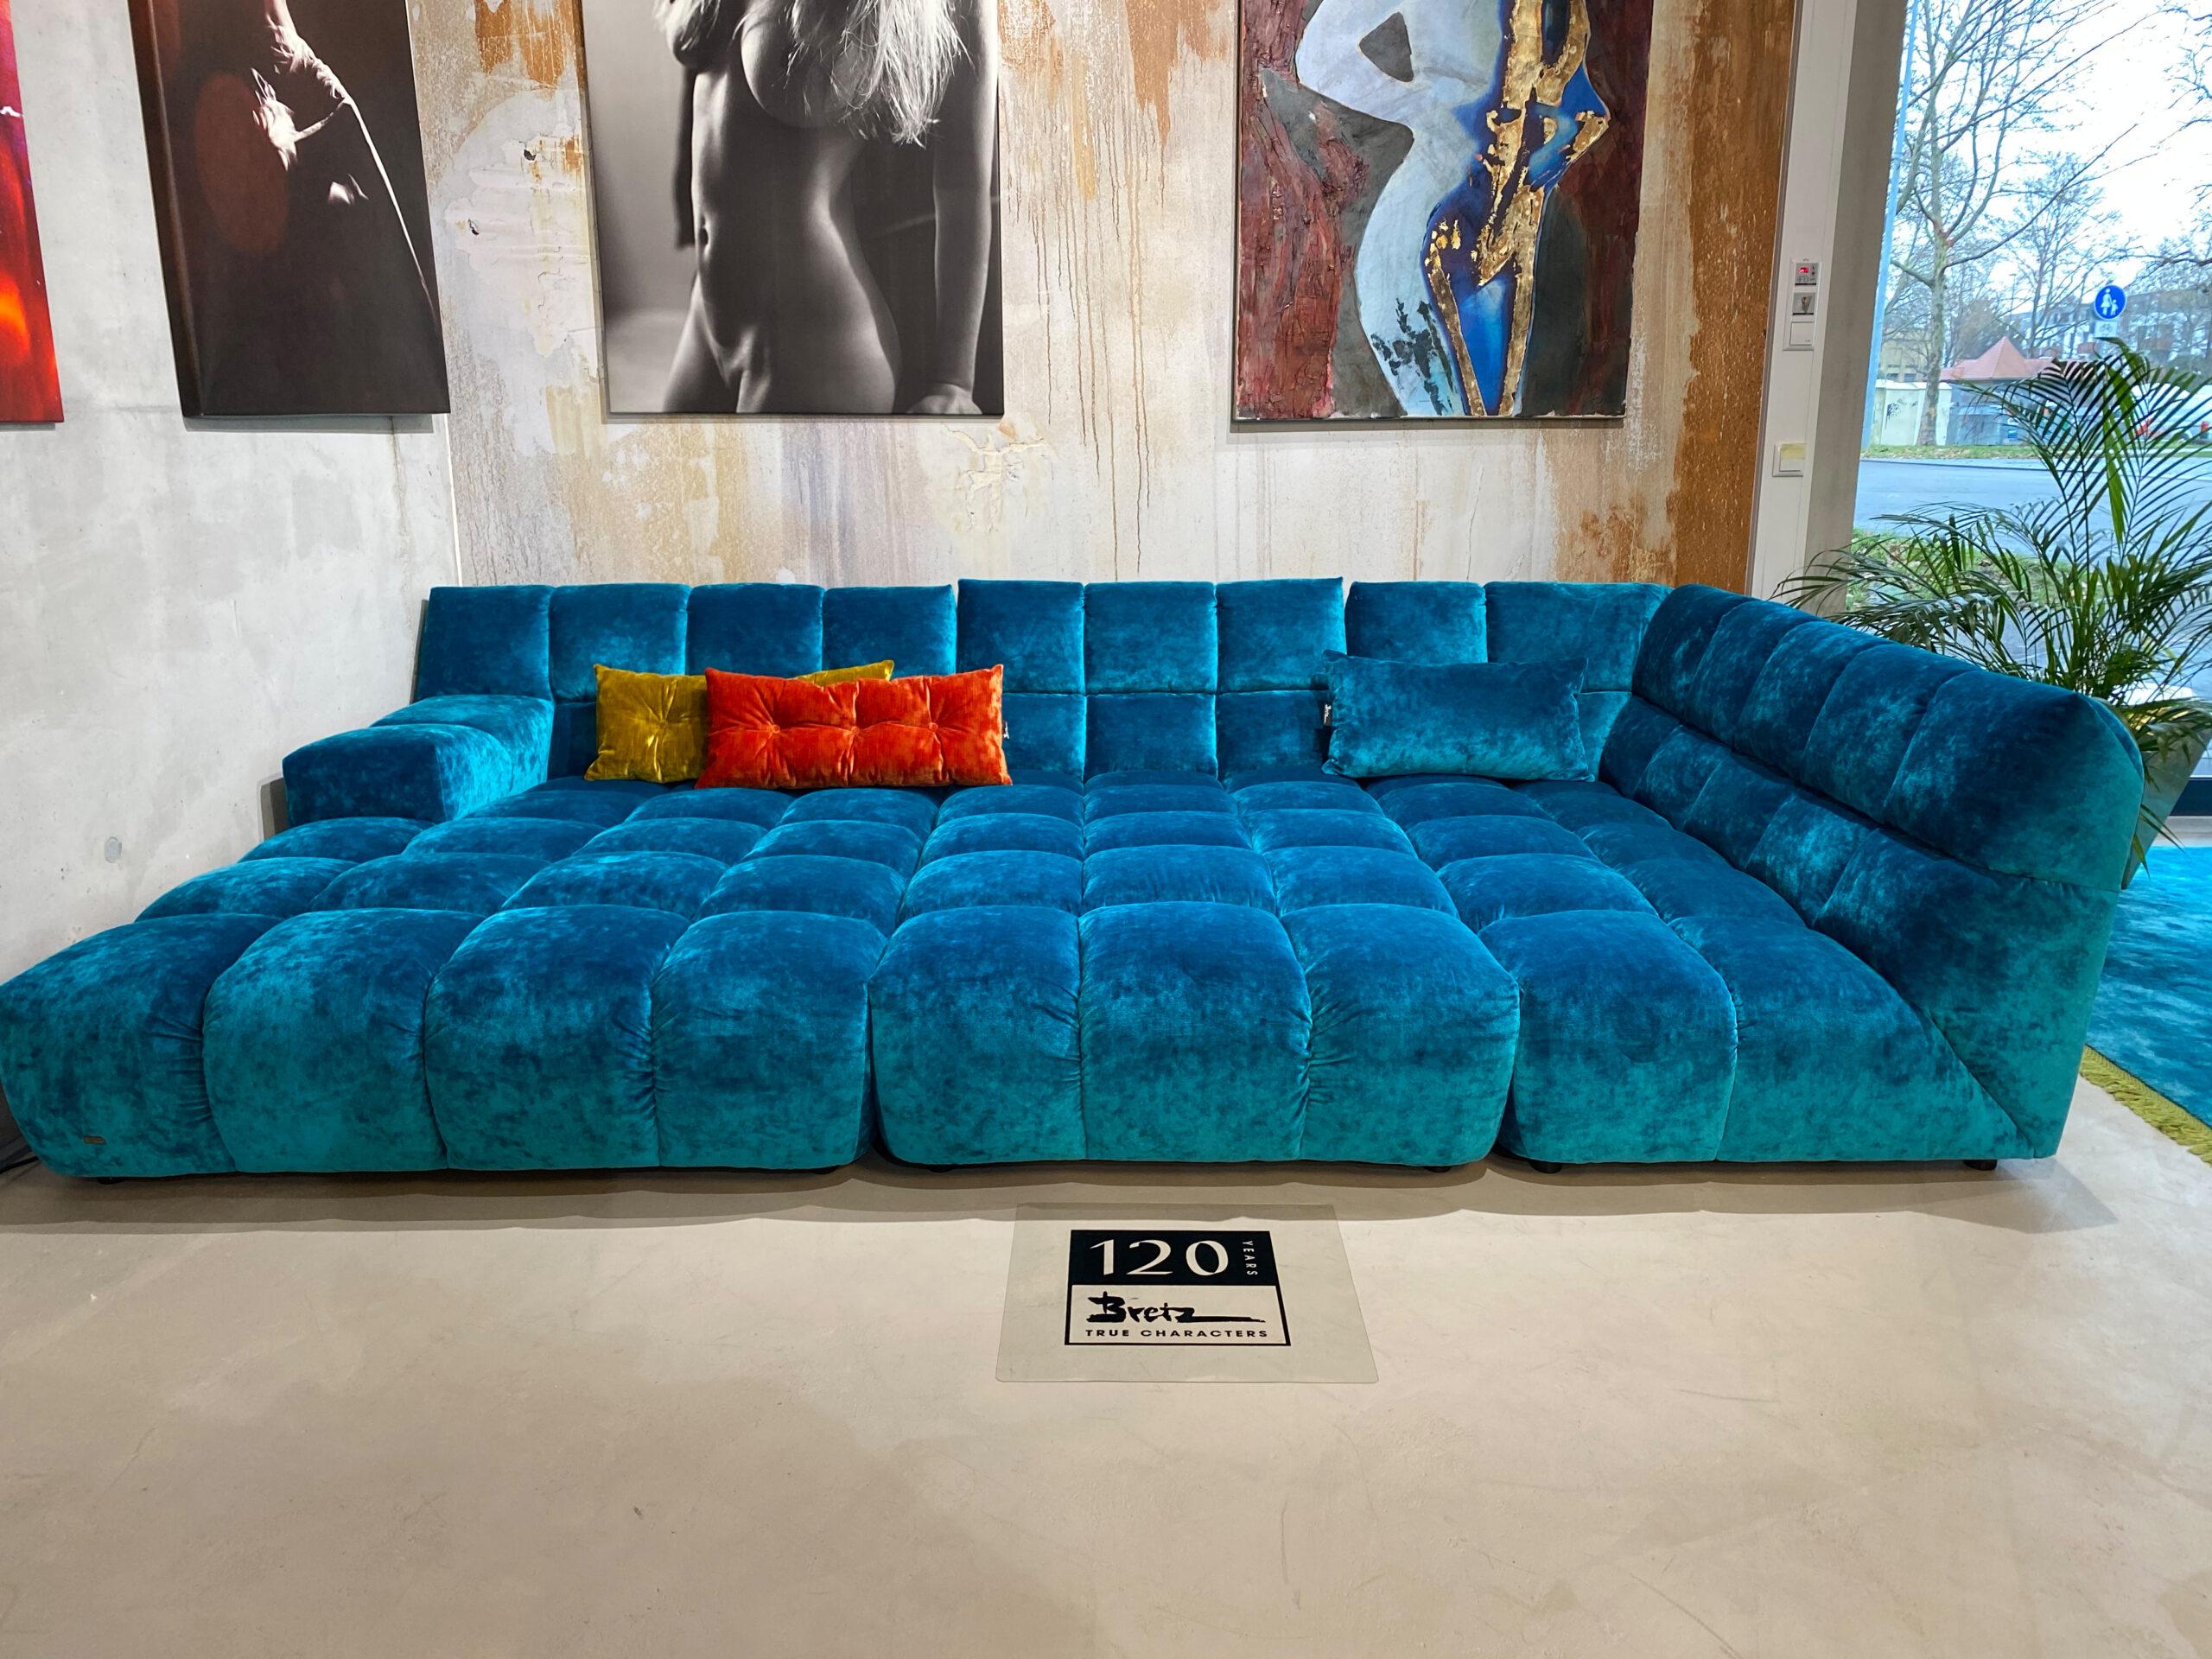 Full Size of Freistil Ausstellungsstück Bretz Ausstellungsstck Ocean 7 Ohne Zierkissen Sofa Bett Küche Wohnzimmer Freistil Ausstellungsstück